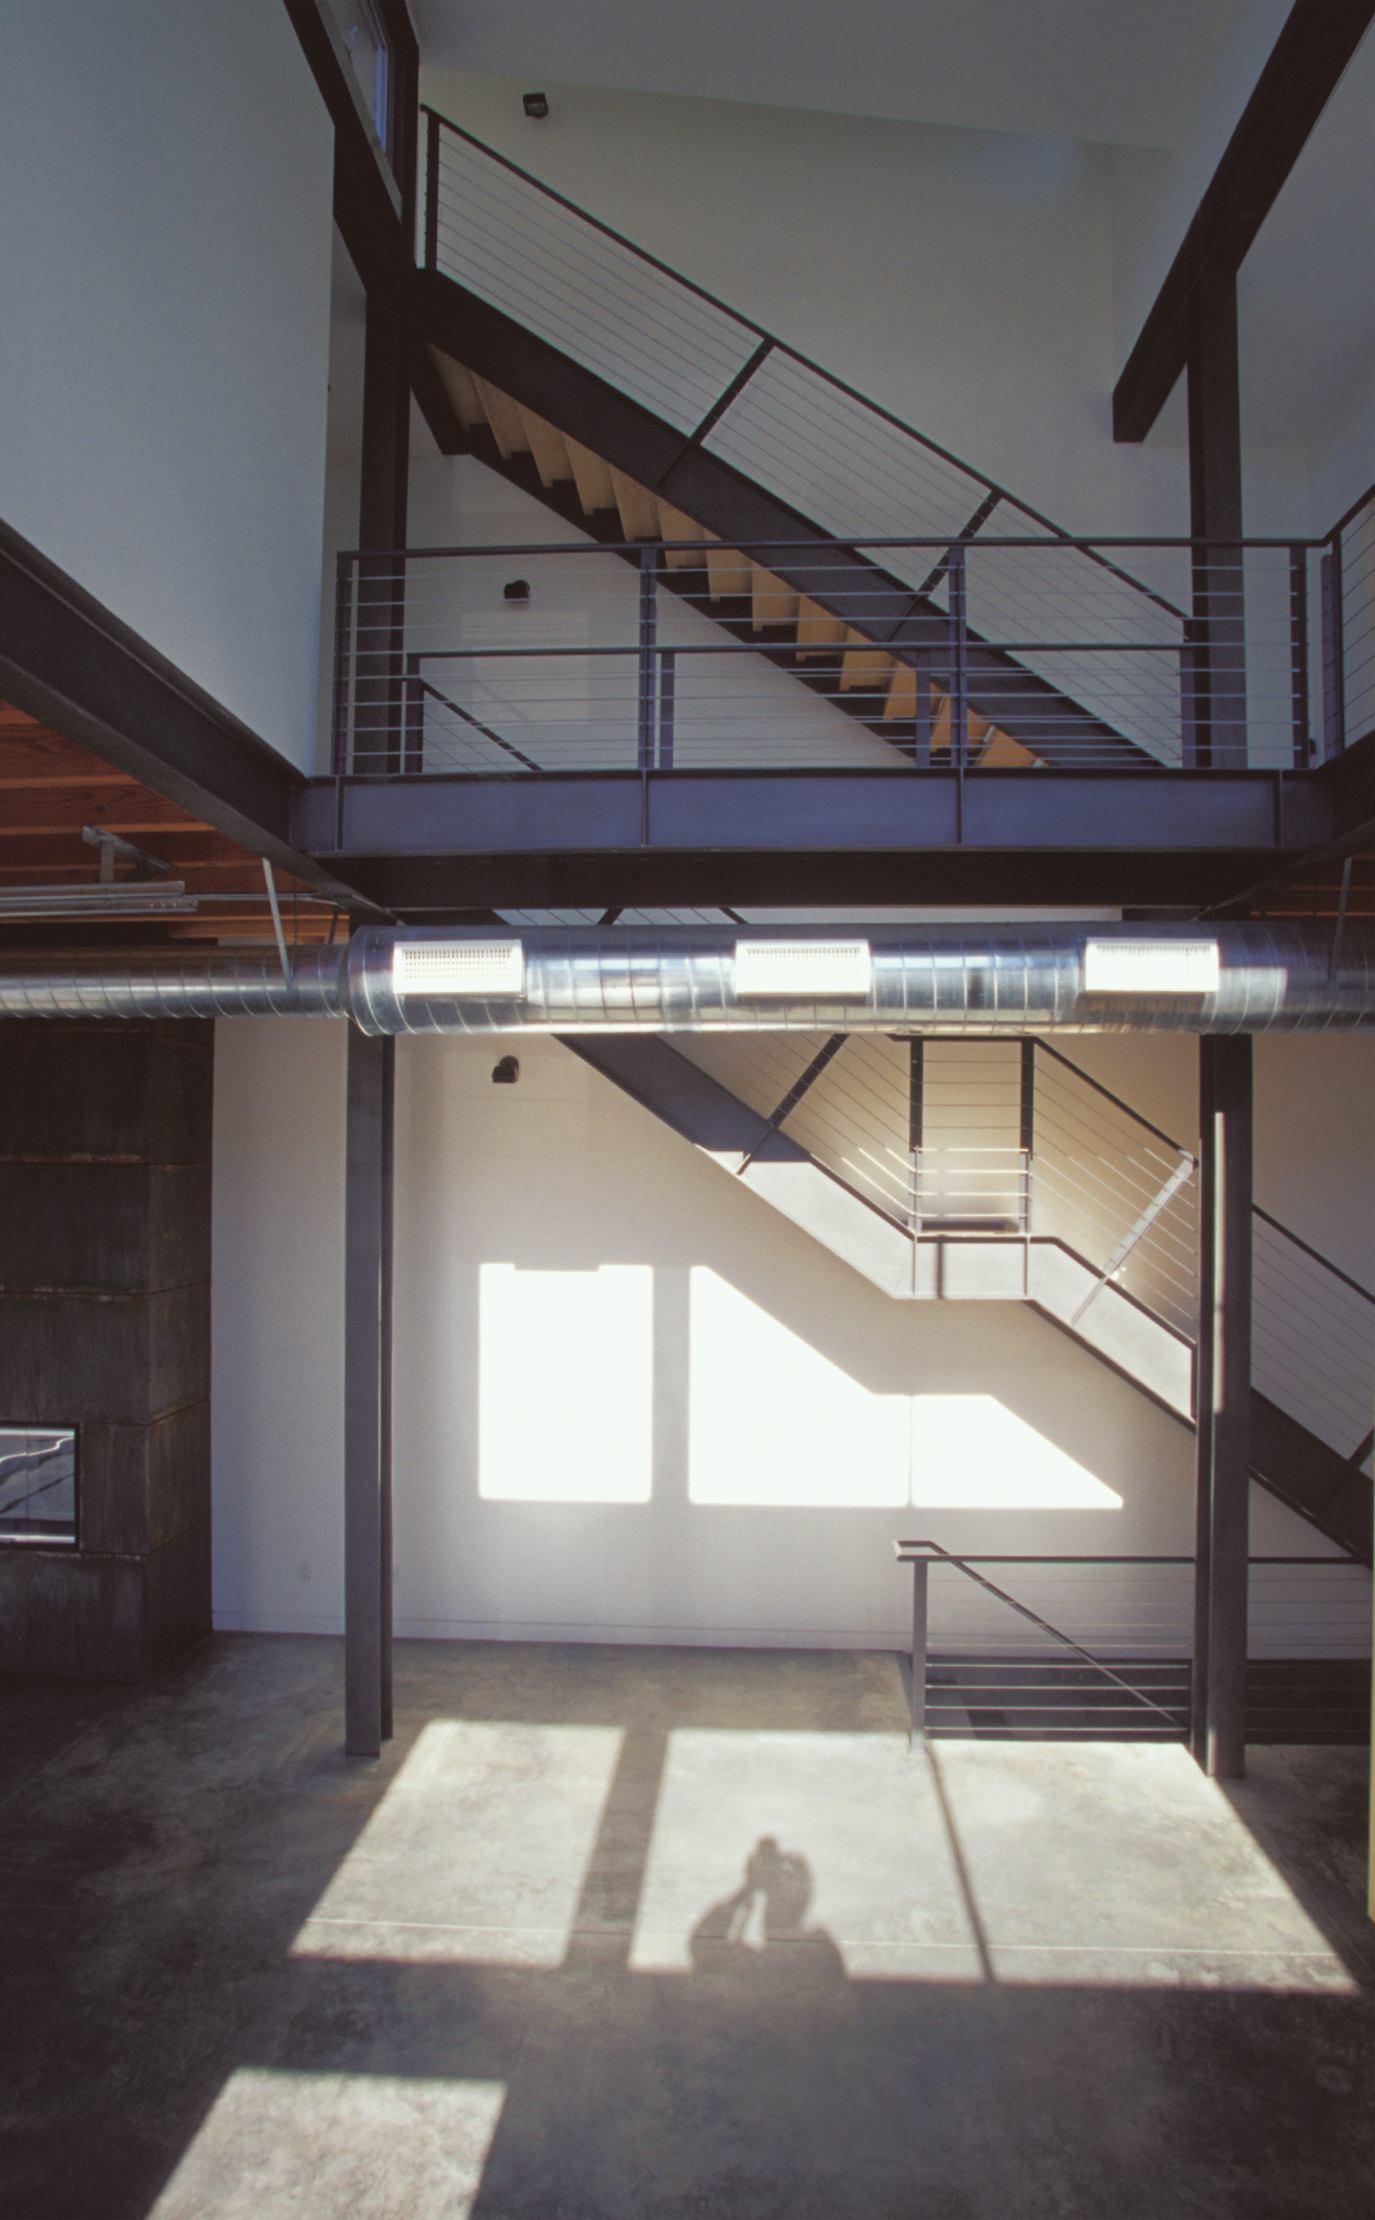 Venice beach lofts venice calif residential architect for Residential architect design awards